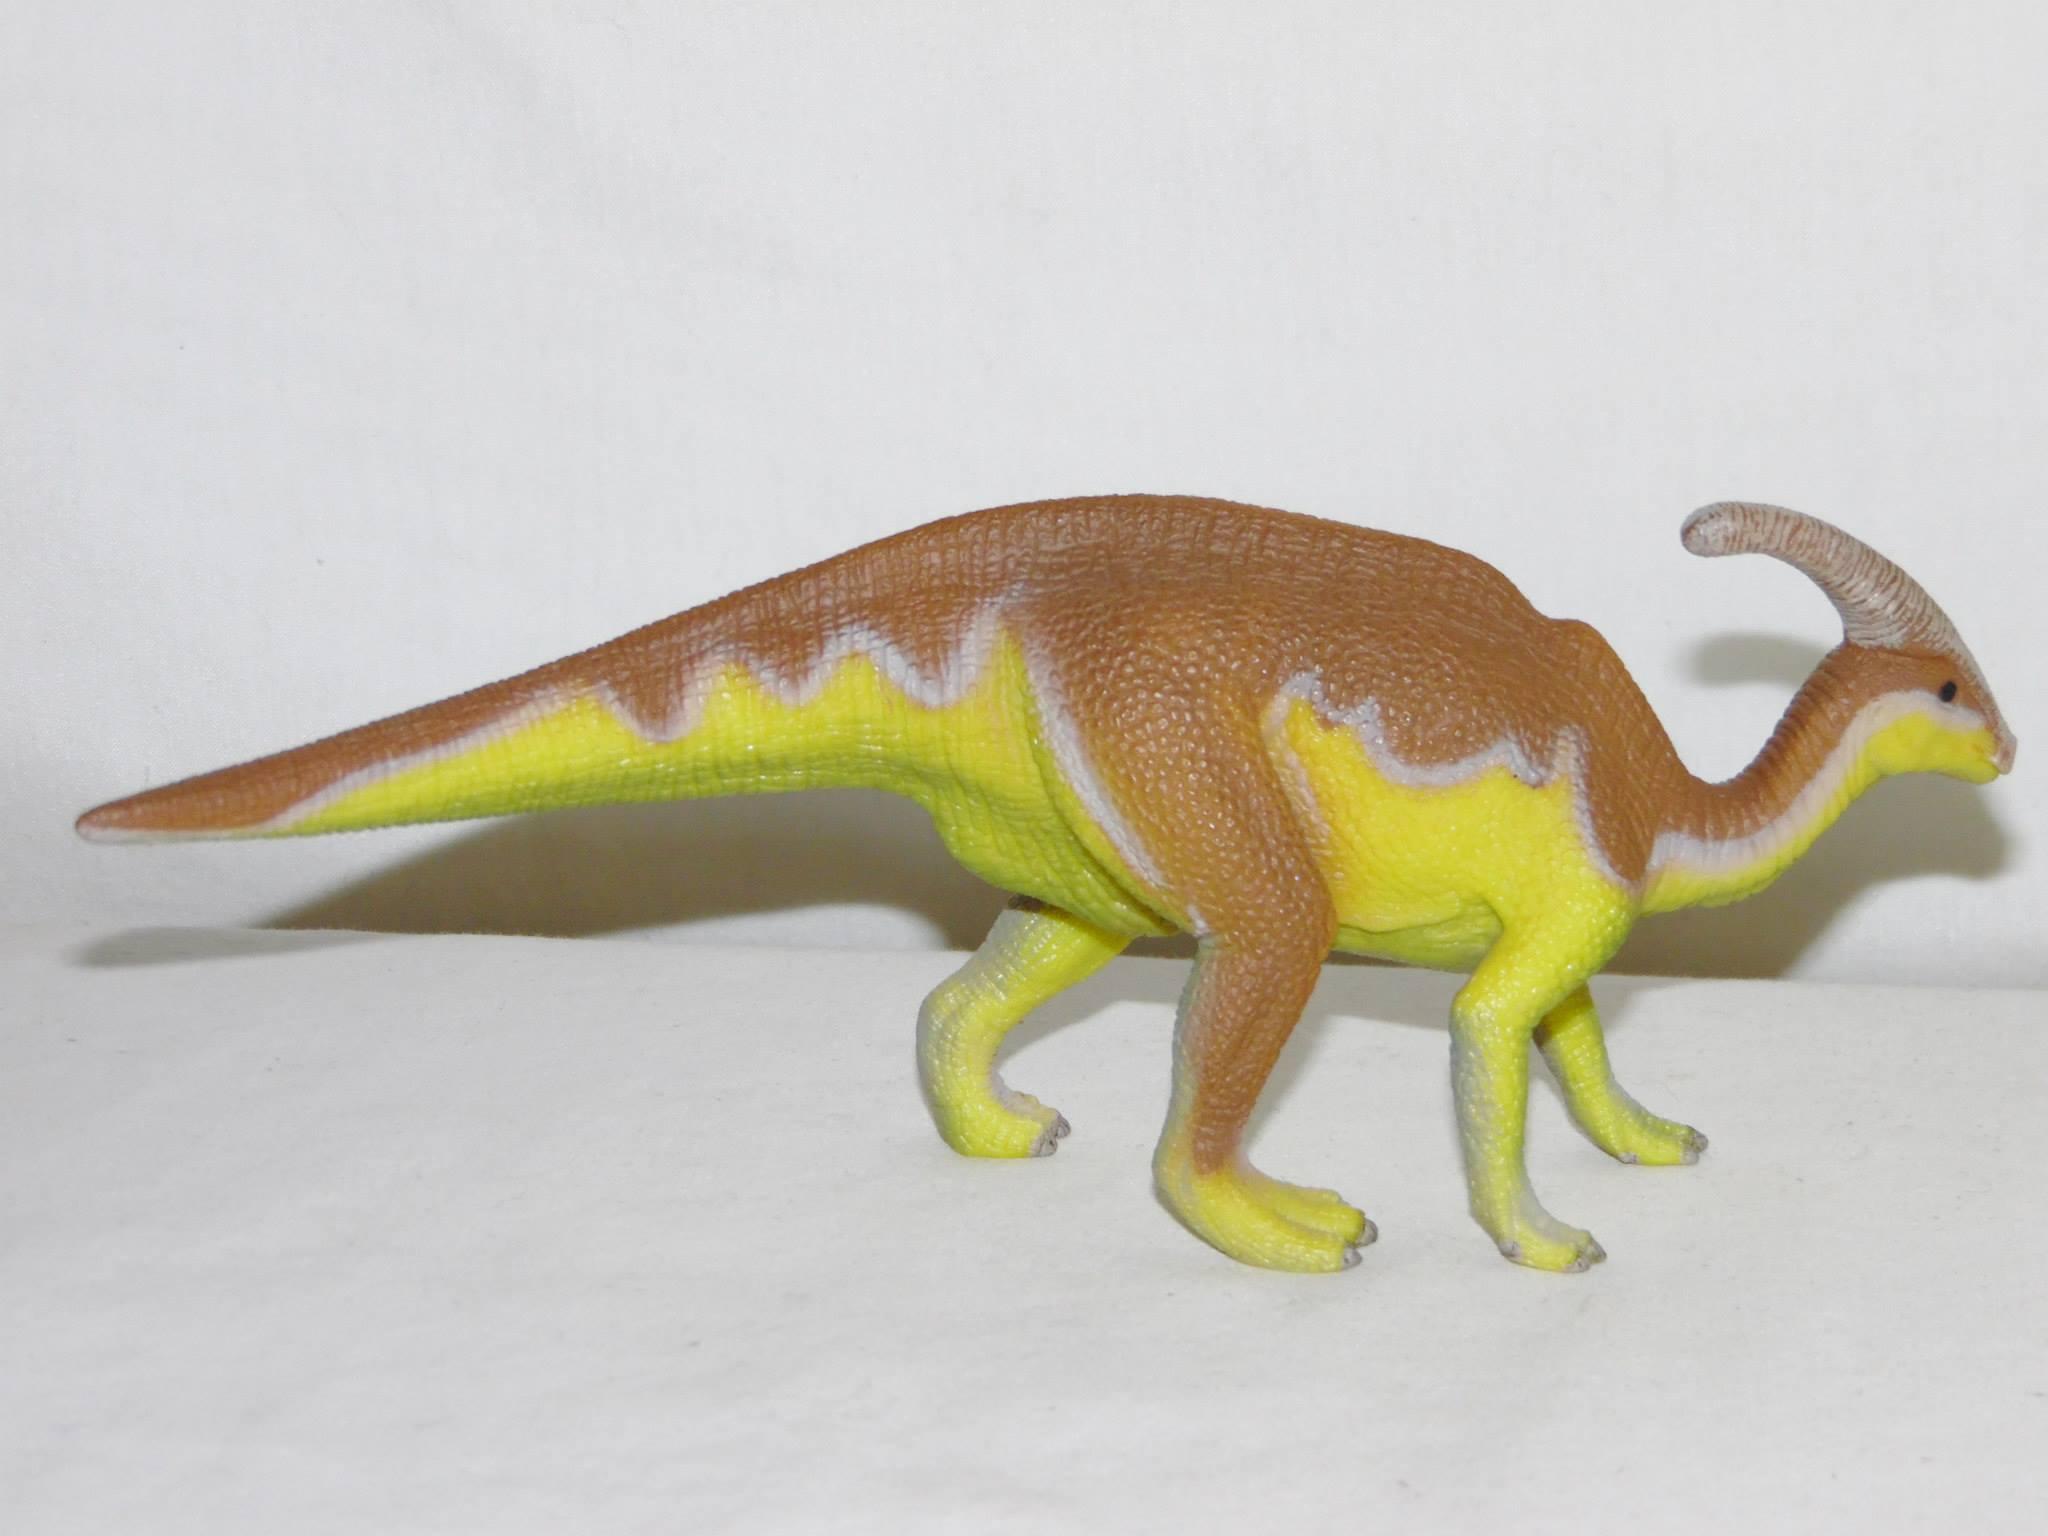 Parasaurolophus World Of History By Schleich Dinosaur Toy Blog